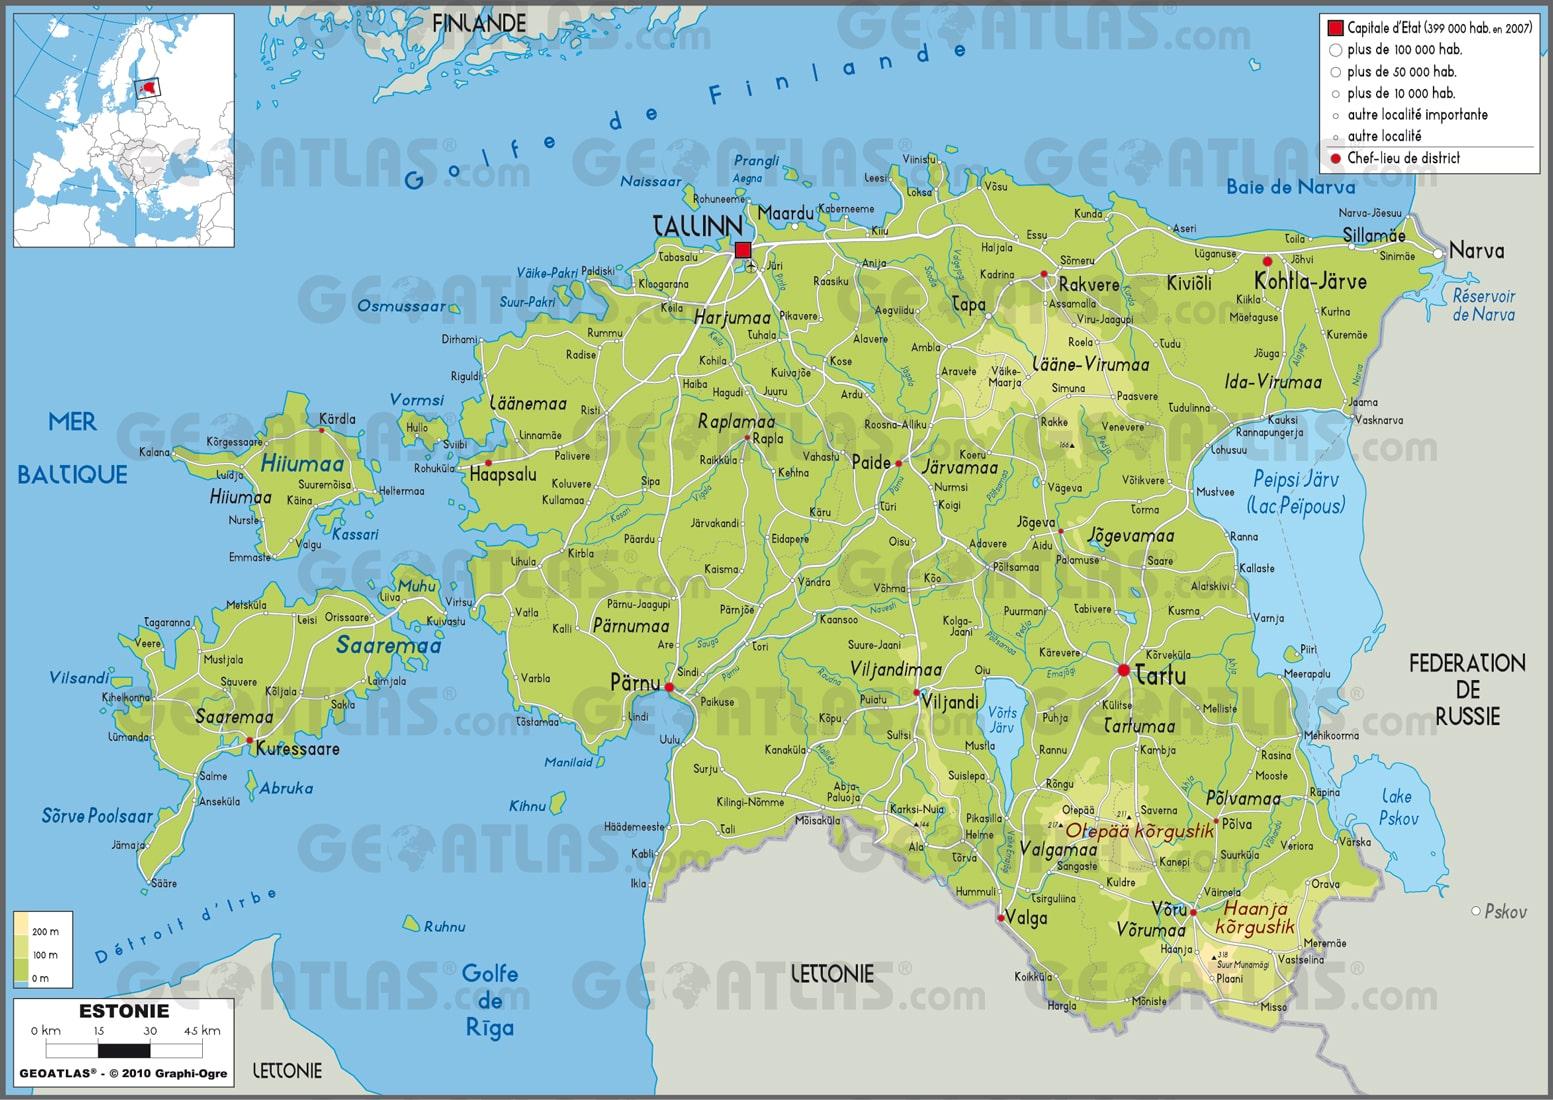 Cartograf.fr : L'Estonie : page 2